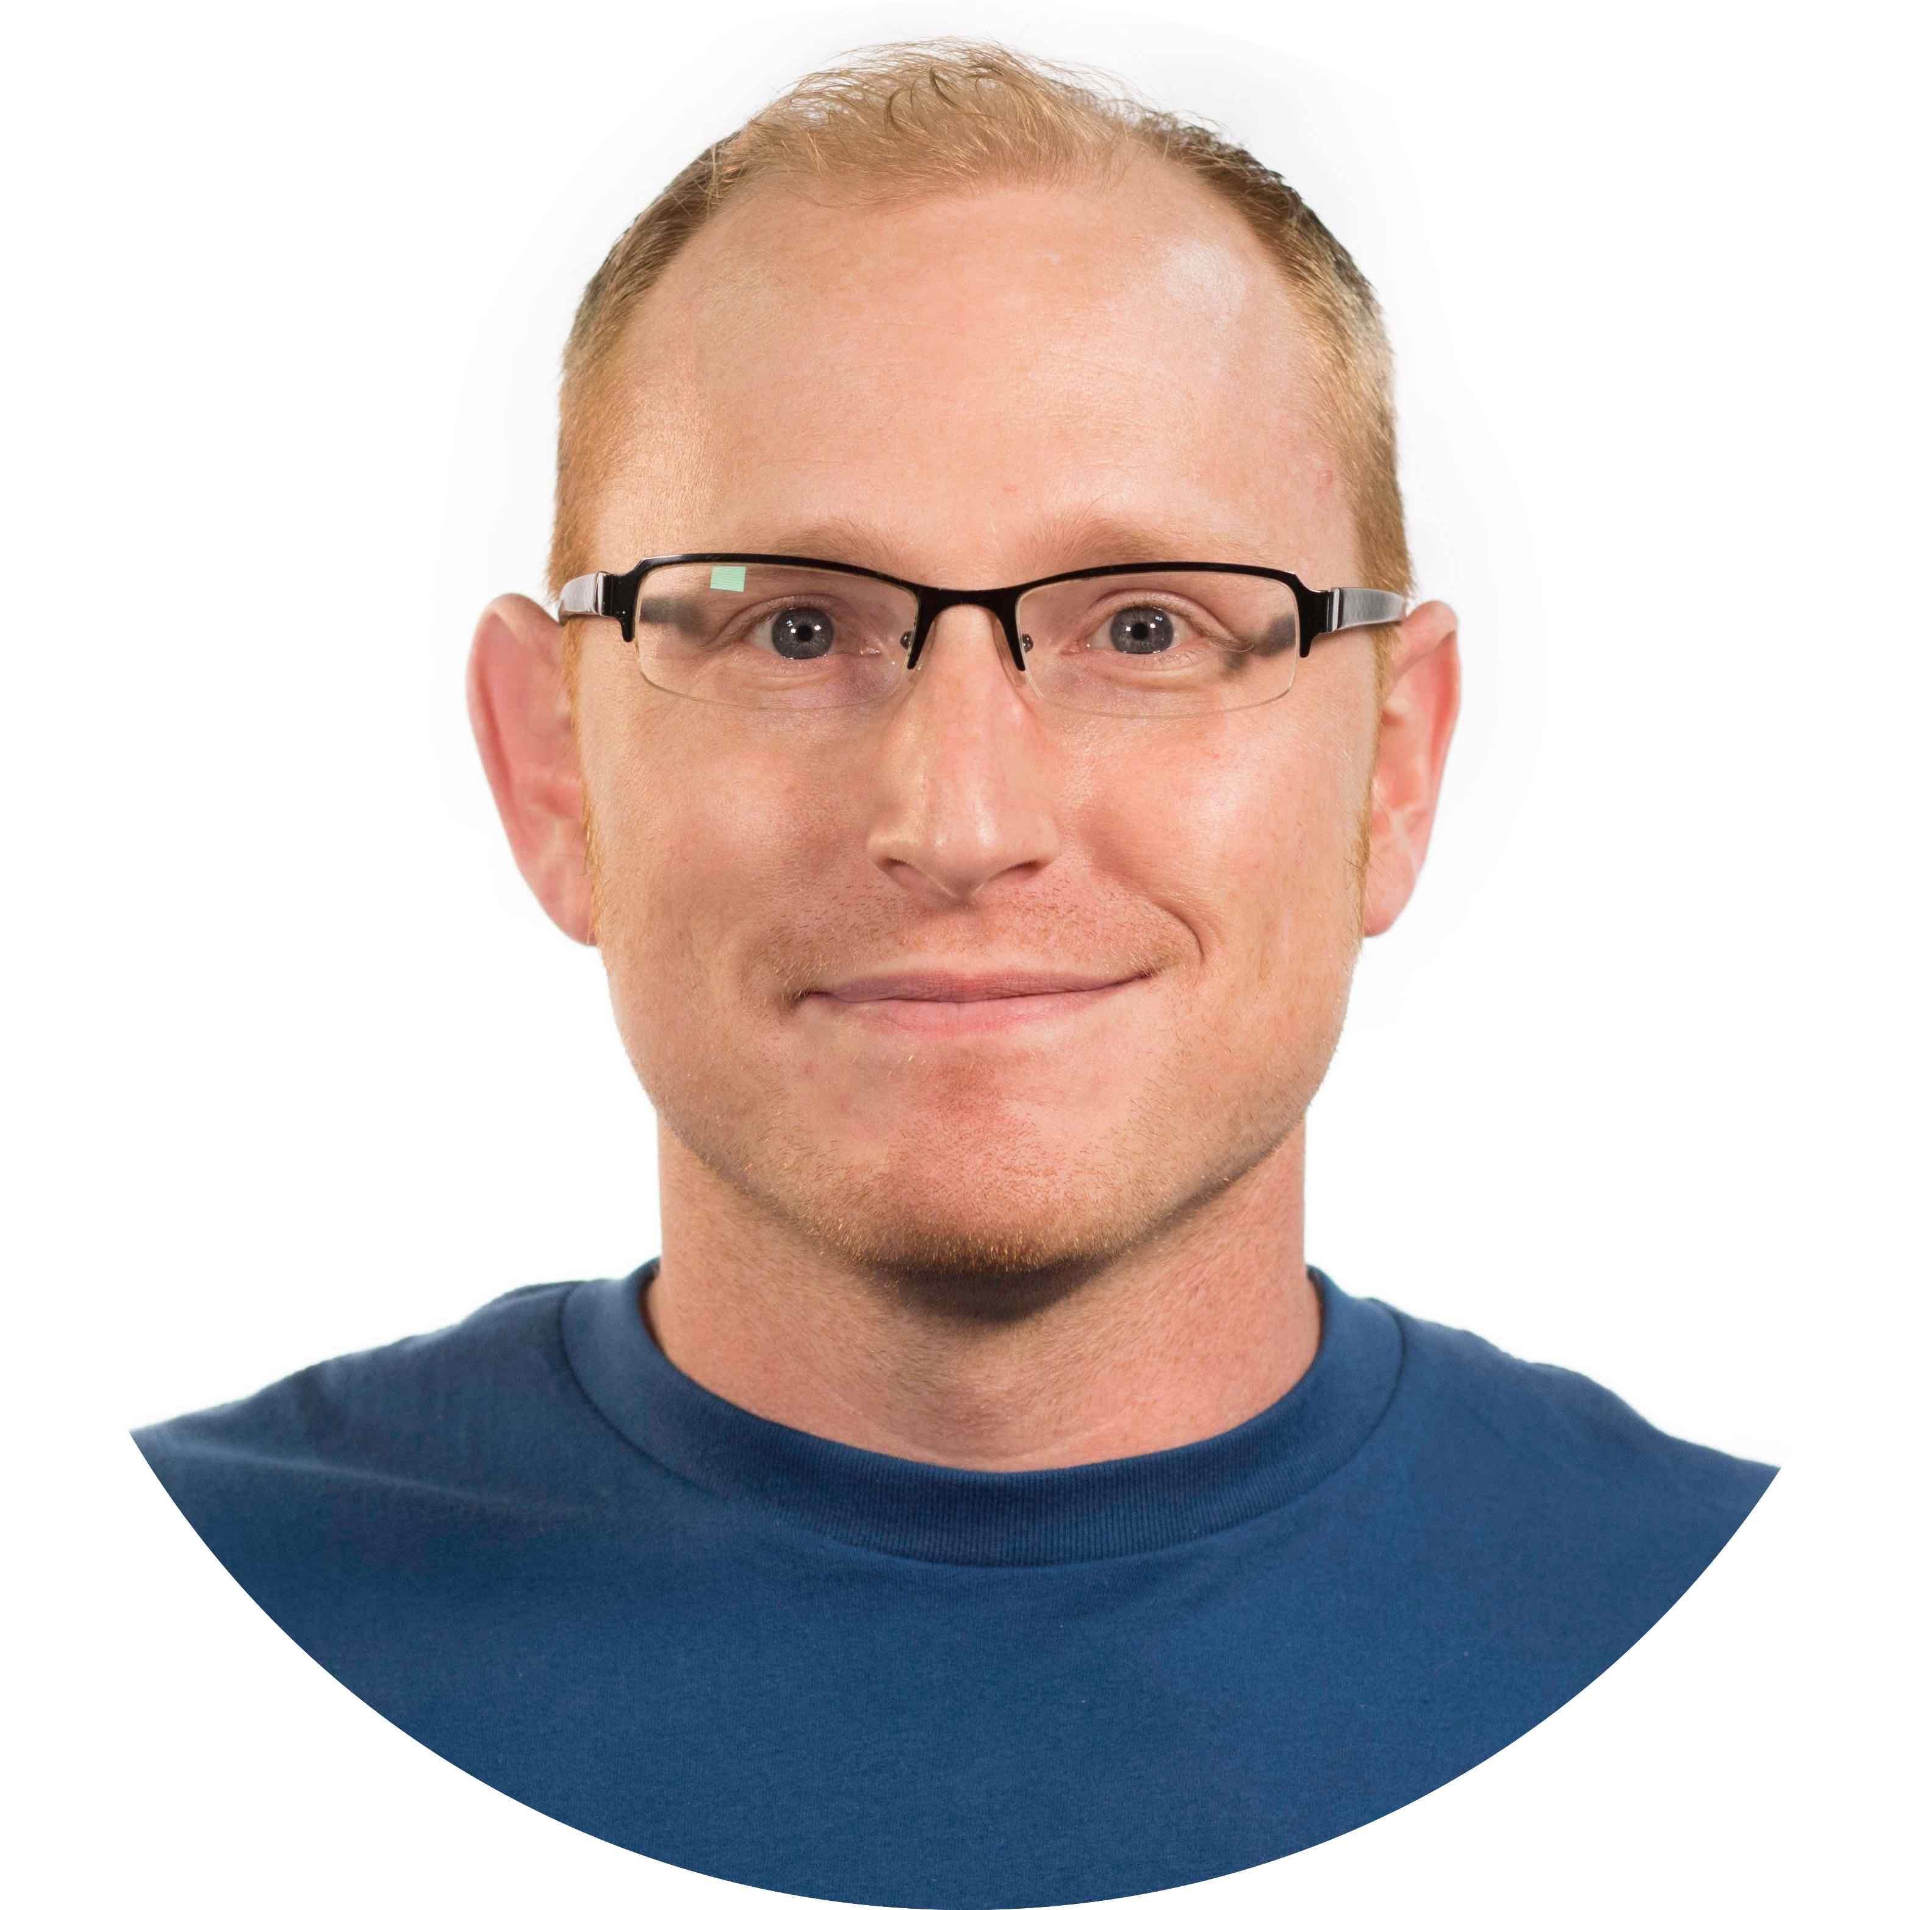 Jonathan Jacobs - Founder DroneAcademy.com